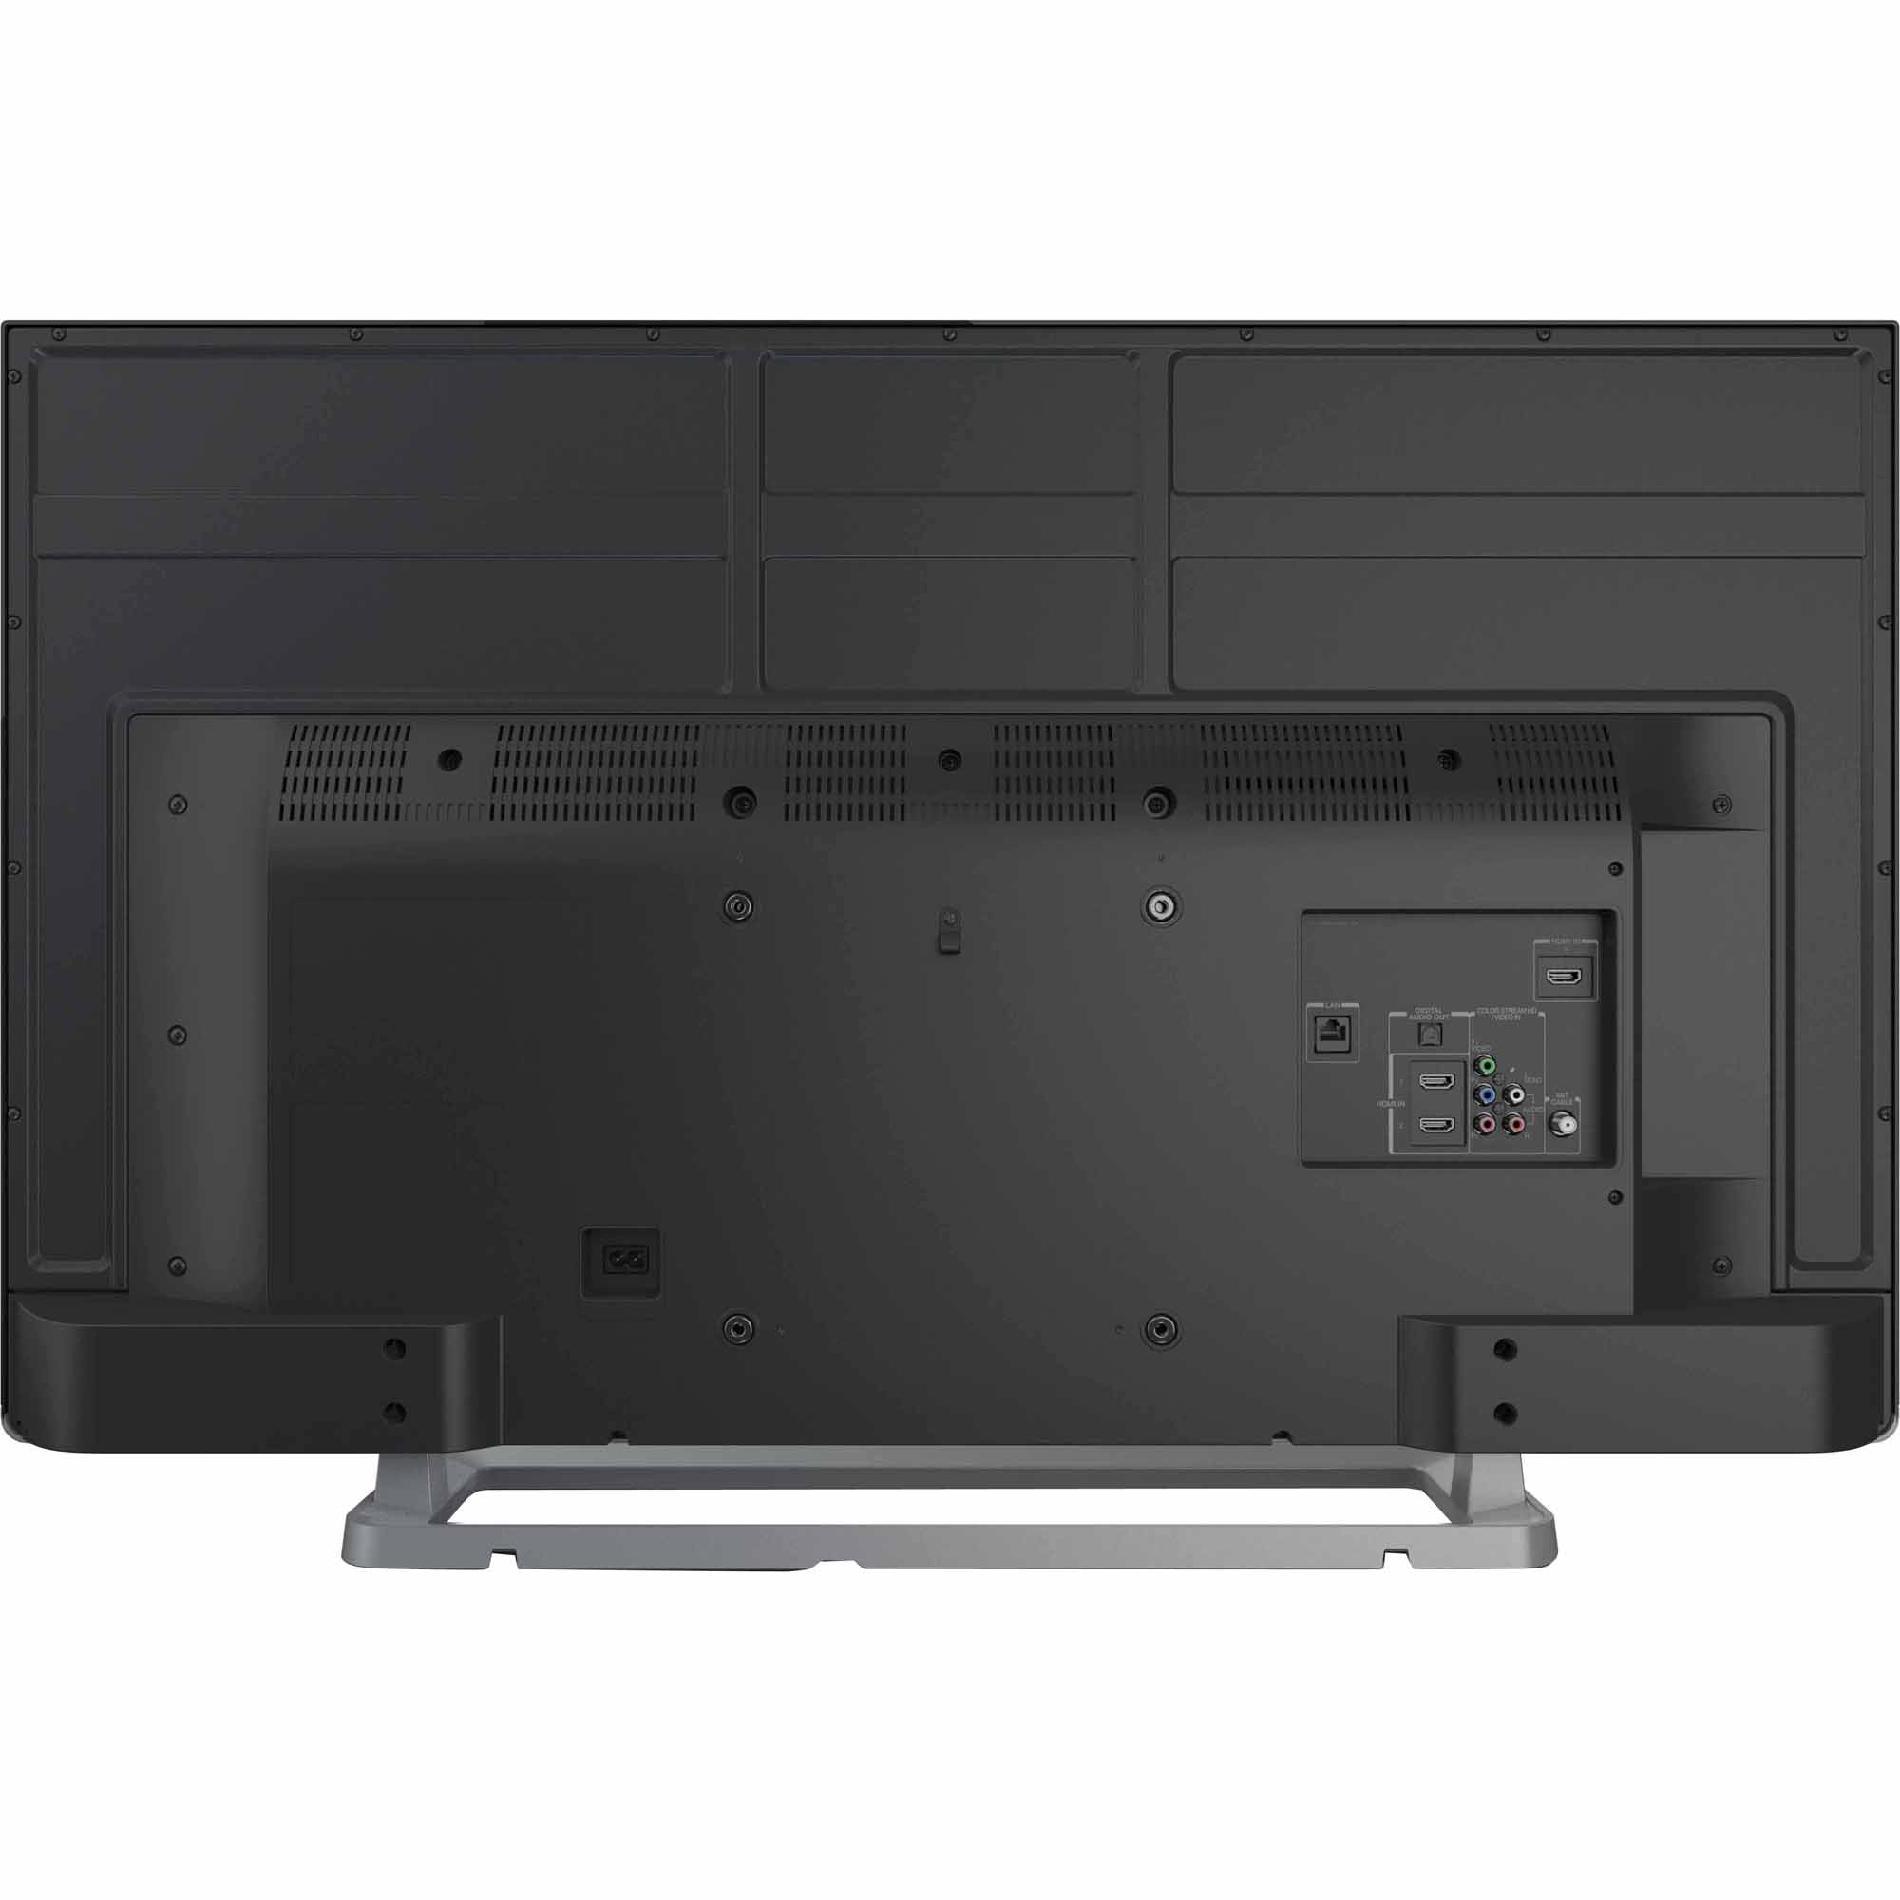 "Toshiba 40"" Class 1080p 120Hz LED Smart HD TV - 40L3400U"